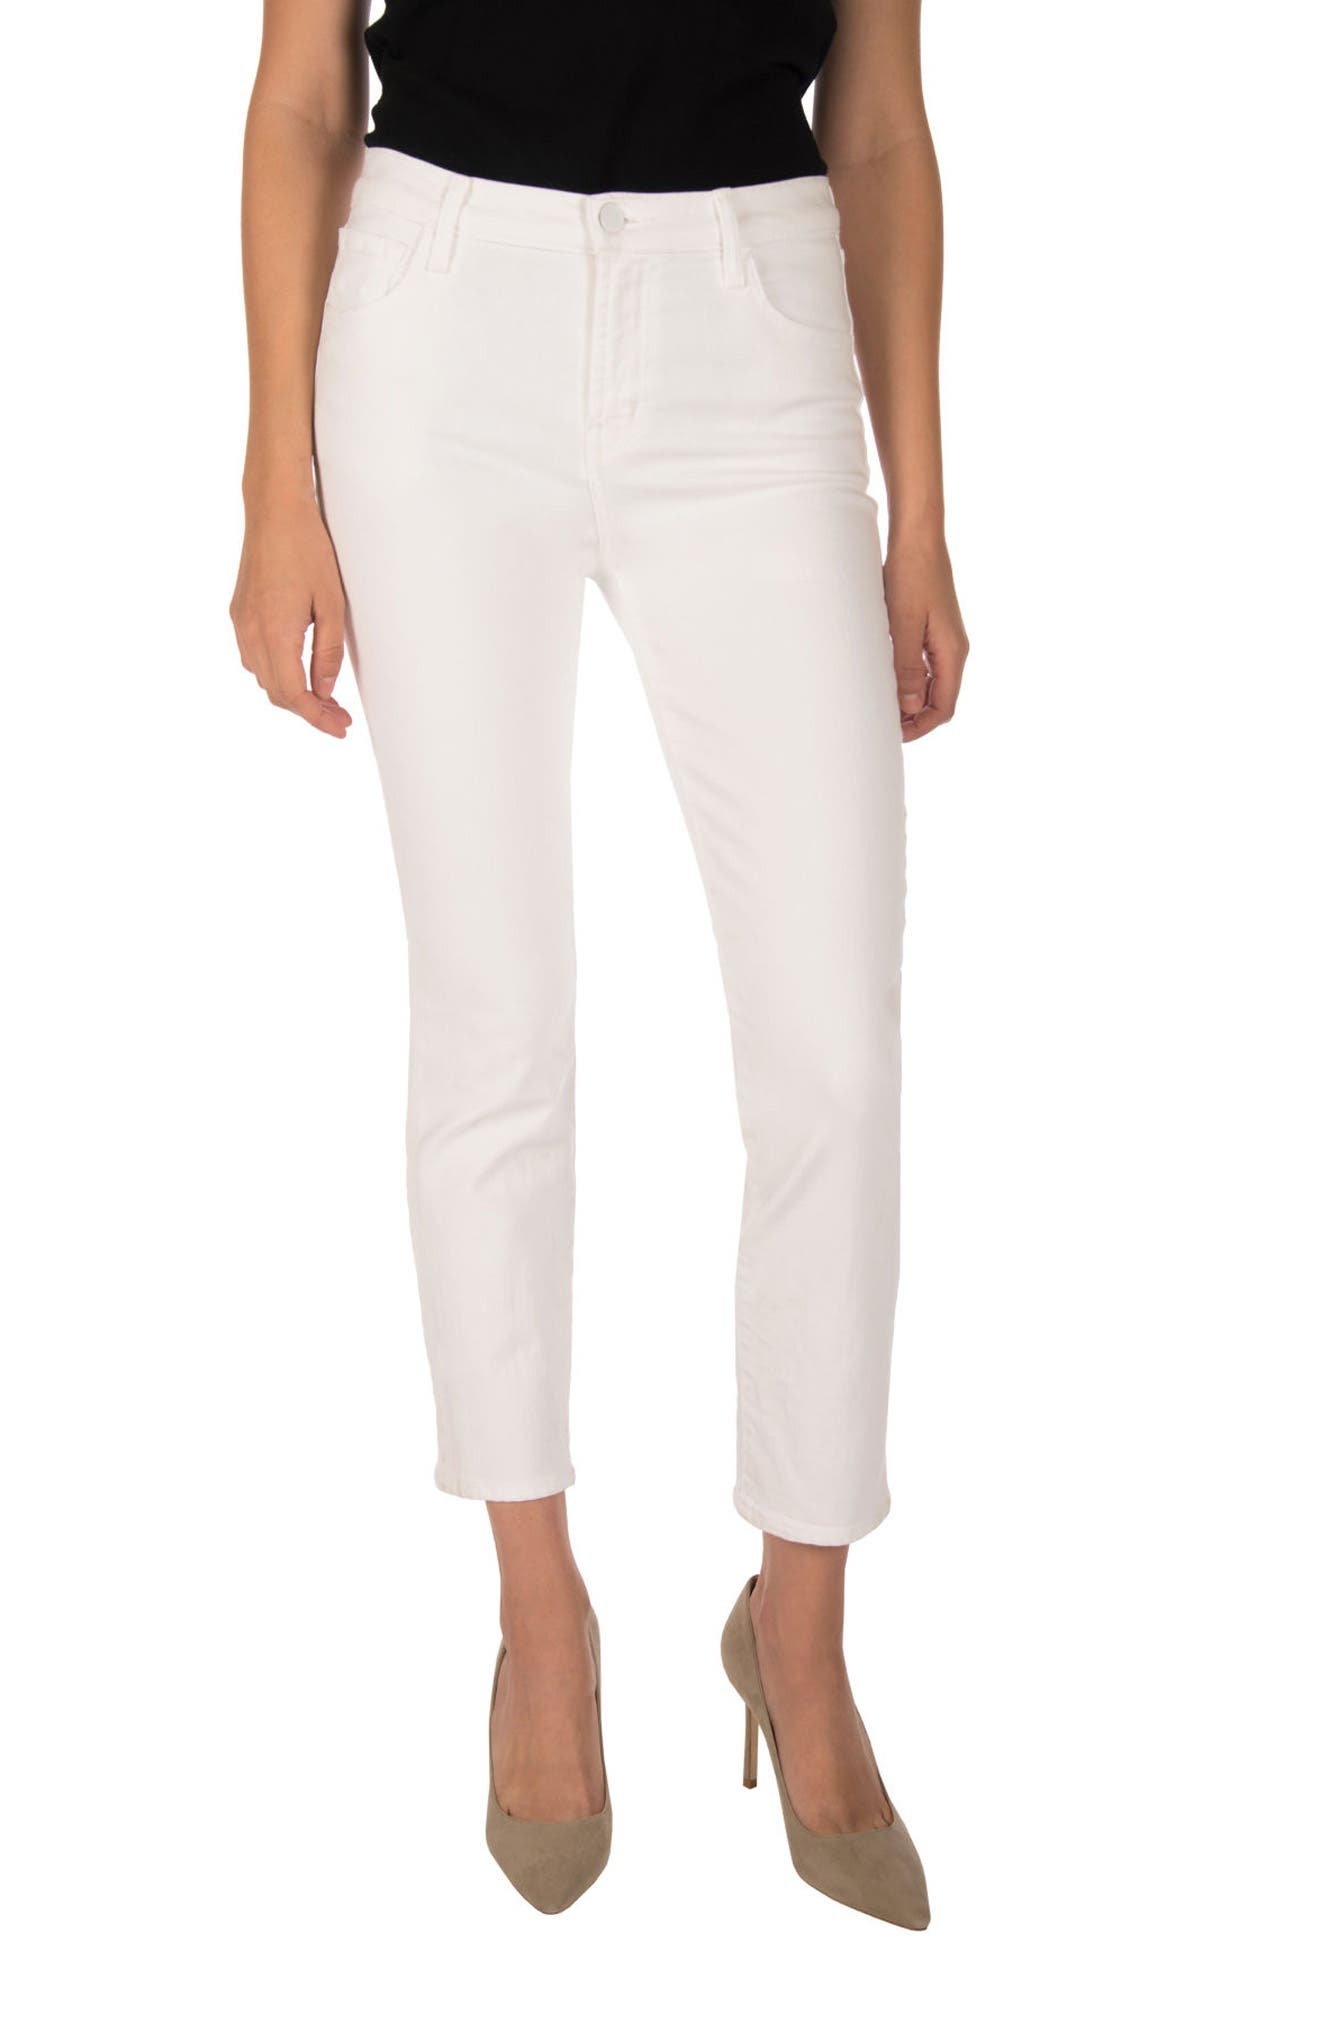 Alternate Image 1 Selected - J Brand Ruby High Waist Crop Jeans (Blanc)